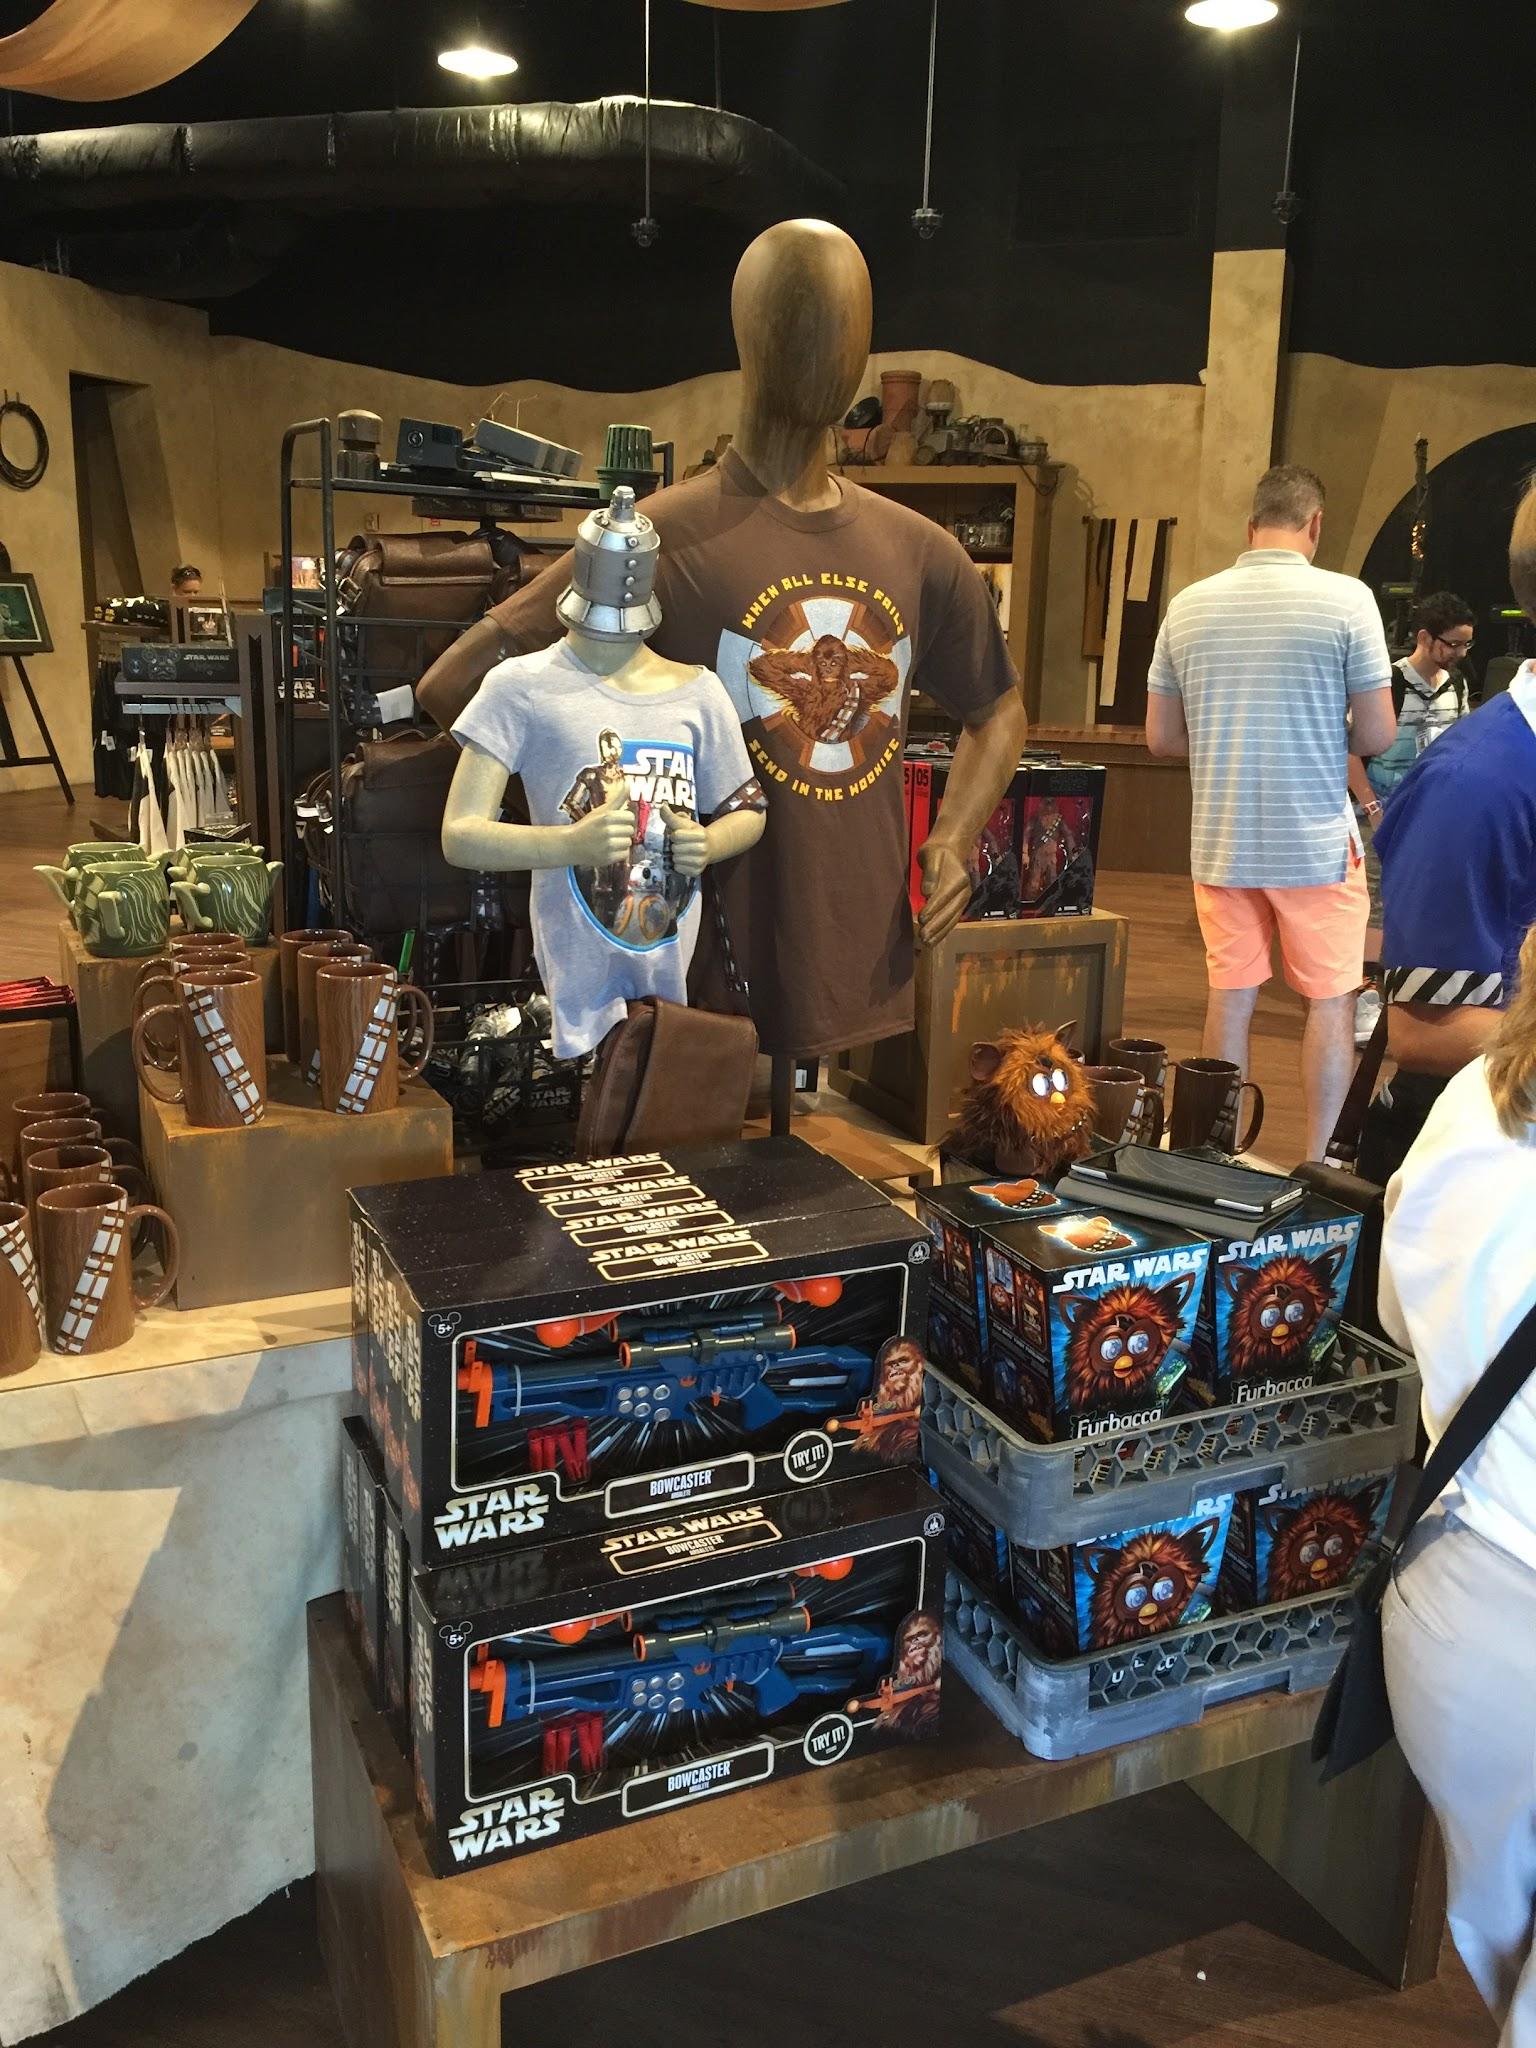 Photos new disney star wars merchandise at watto 39 s grotto for Merchandising star wars